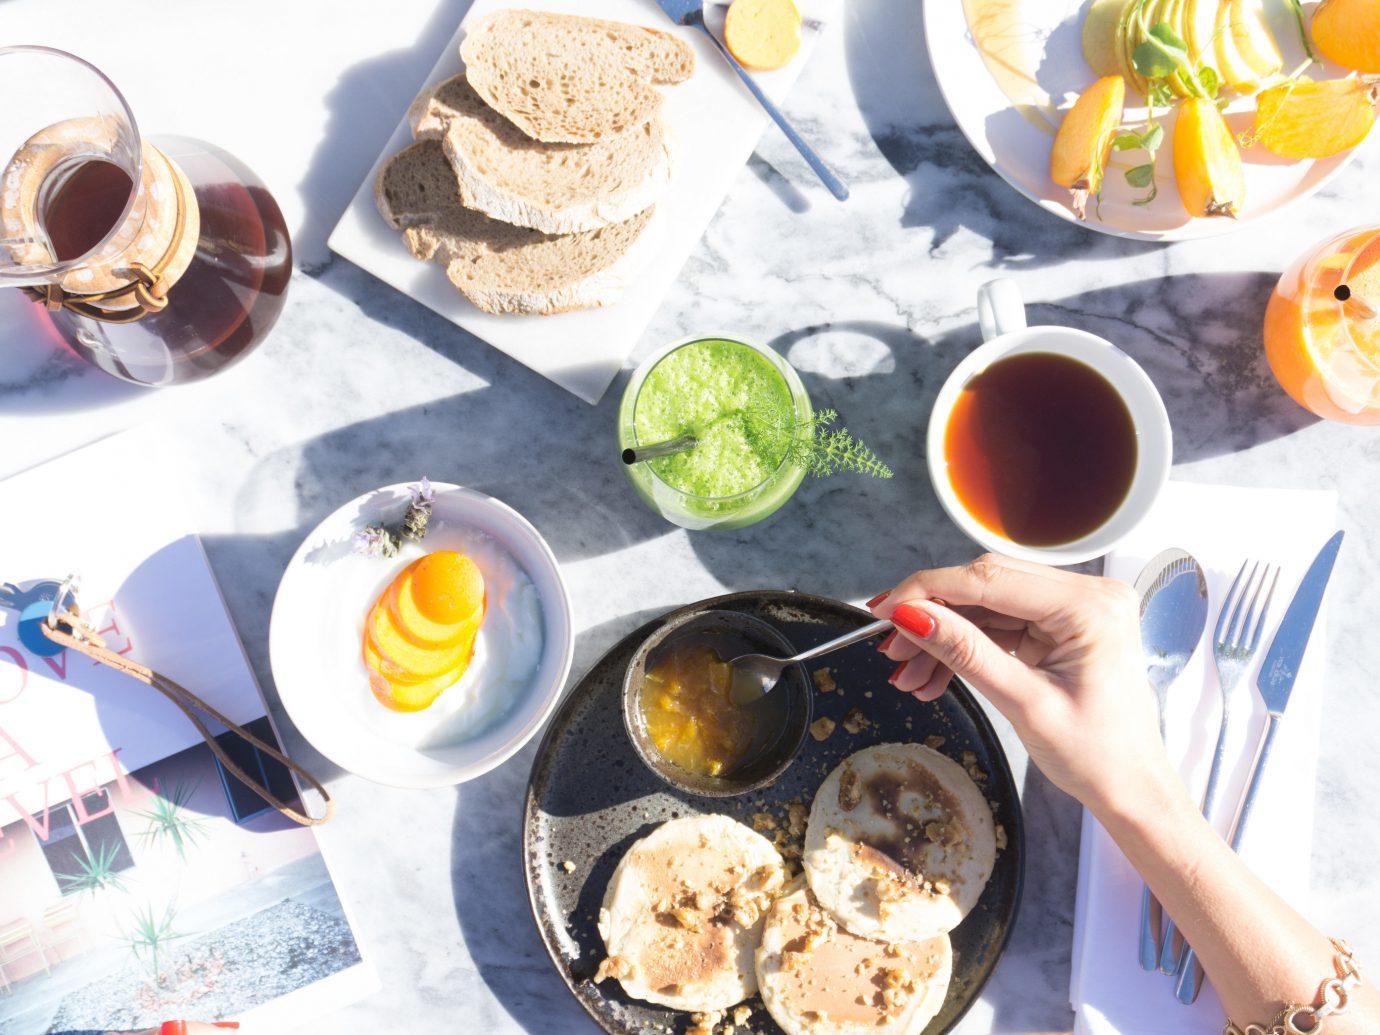 Hotels food meal brunch breakfast dish lunch vegetarian food cuisine full breakfast recipe different variety